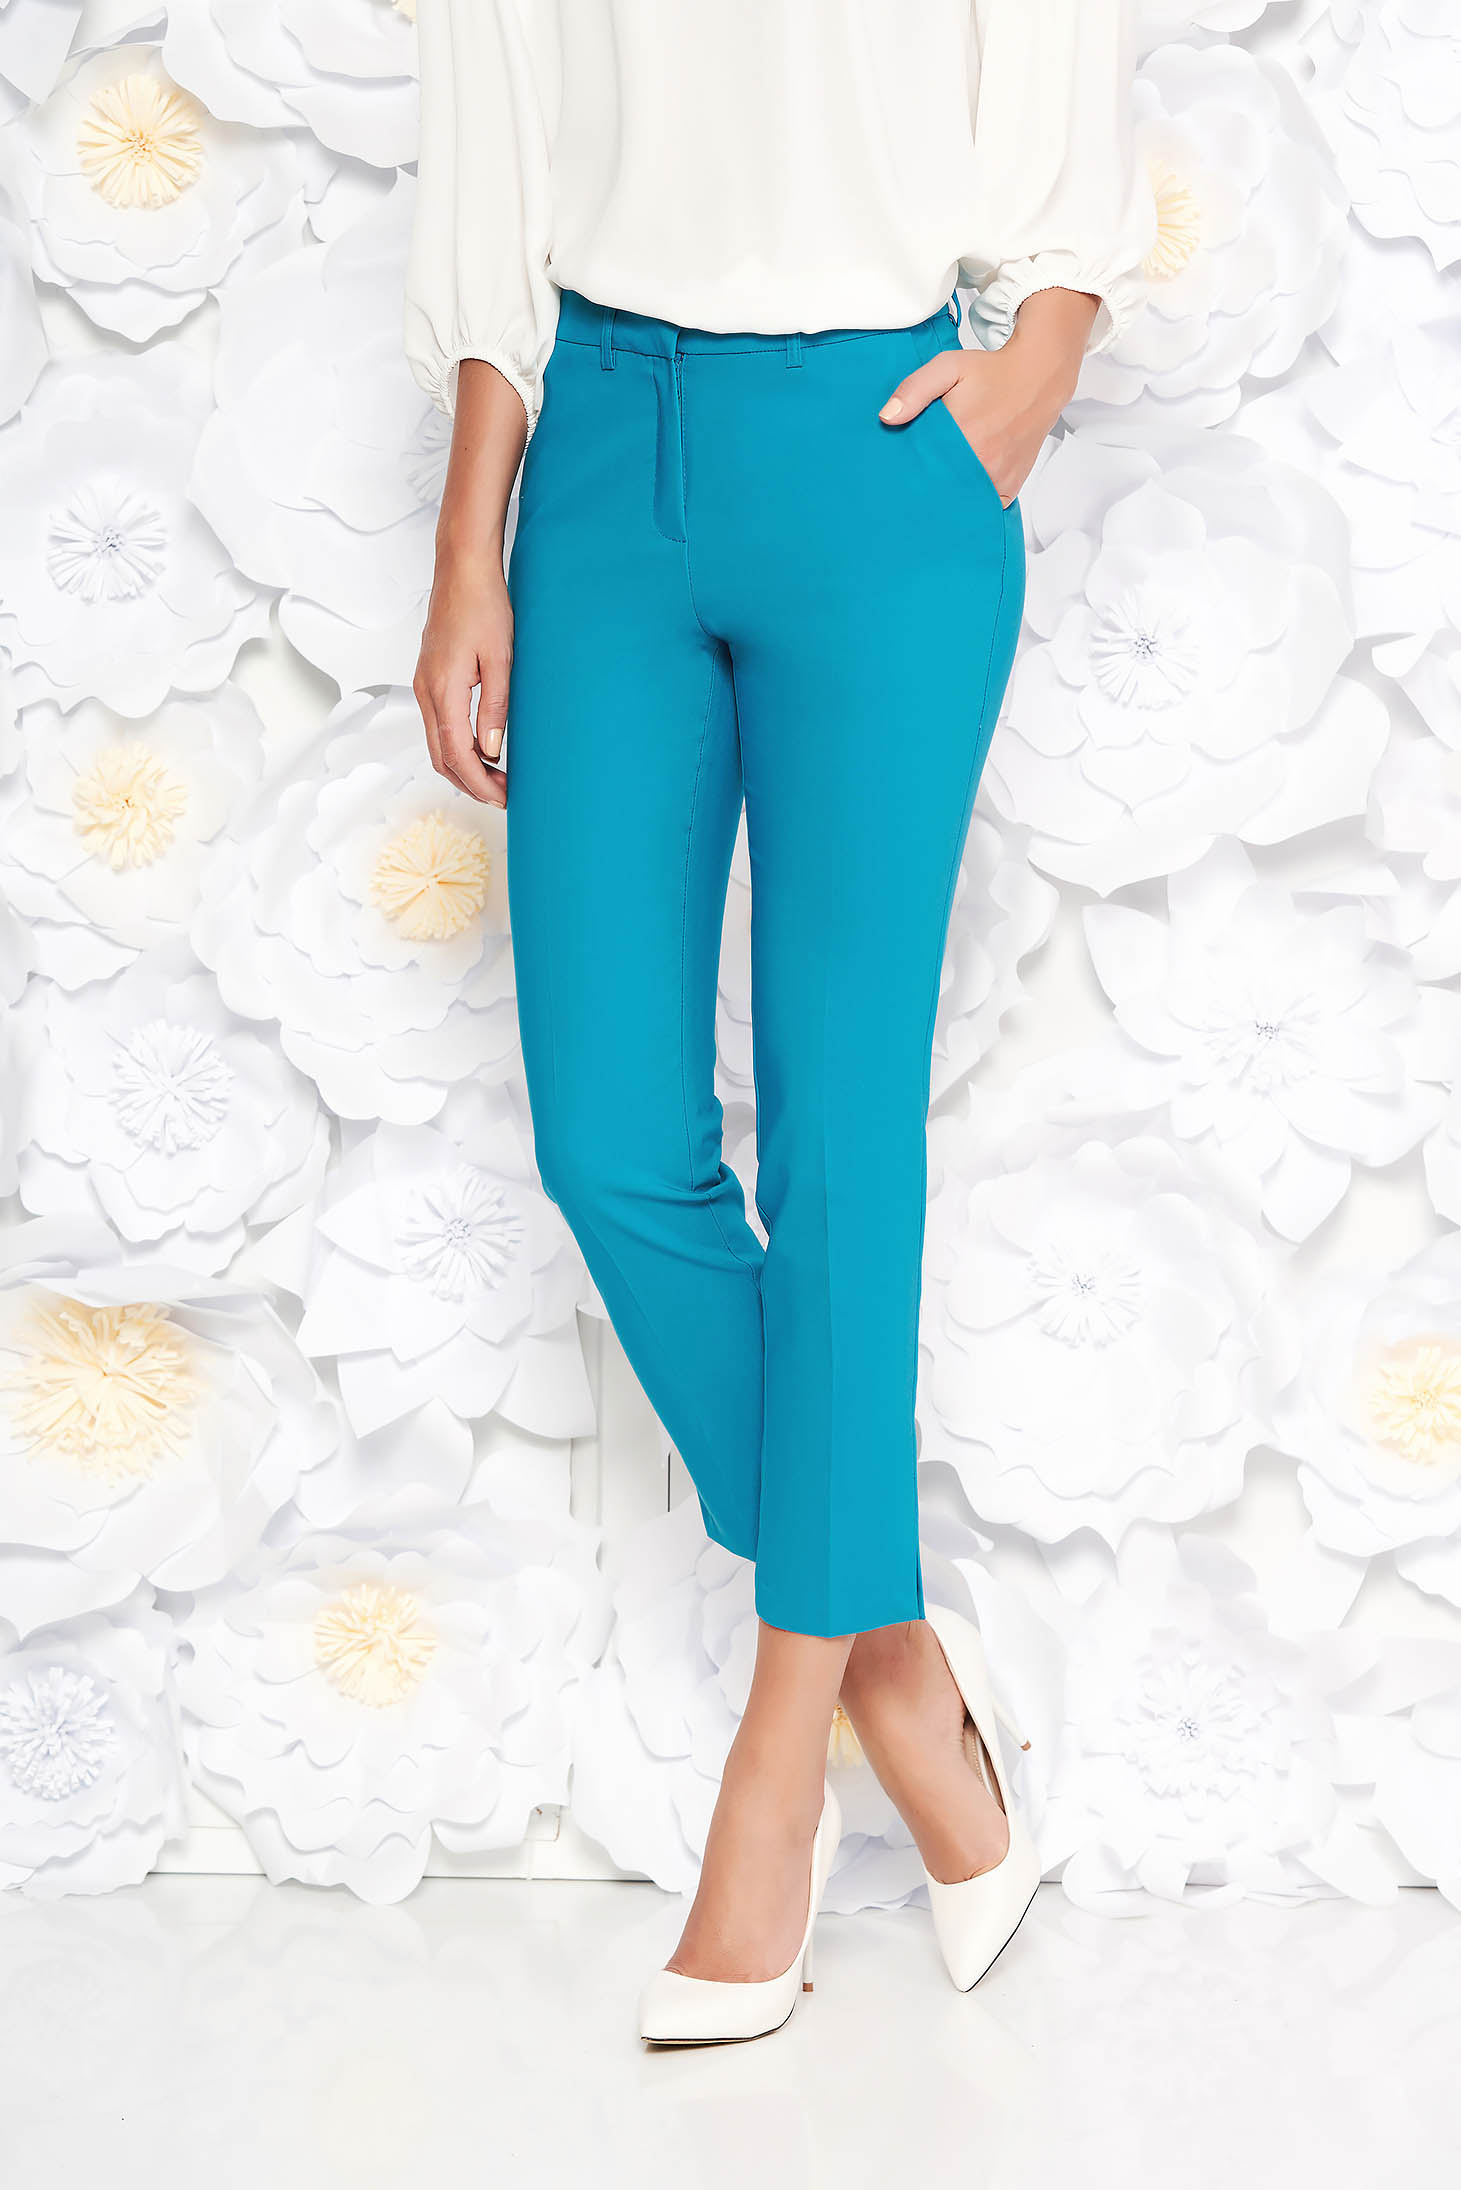 Turquoise elegant trousers with medium waist slightly elastic cotton